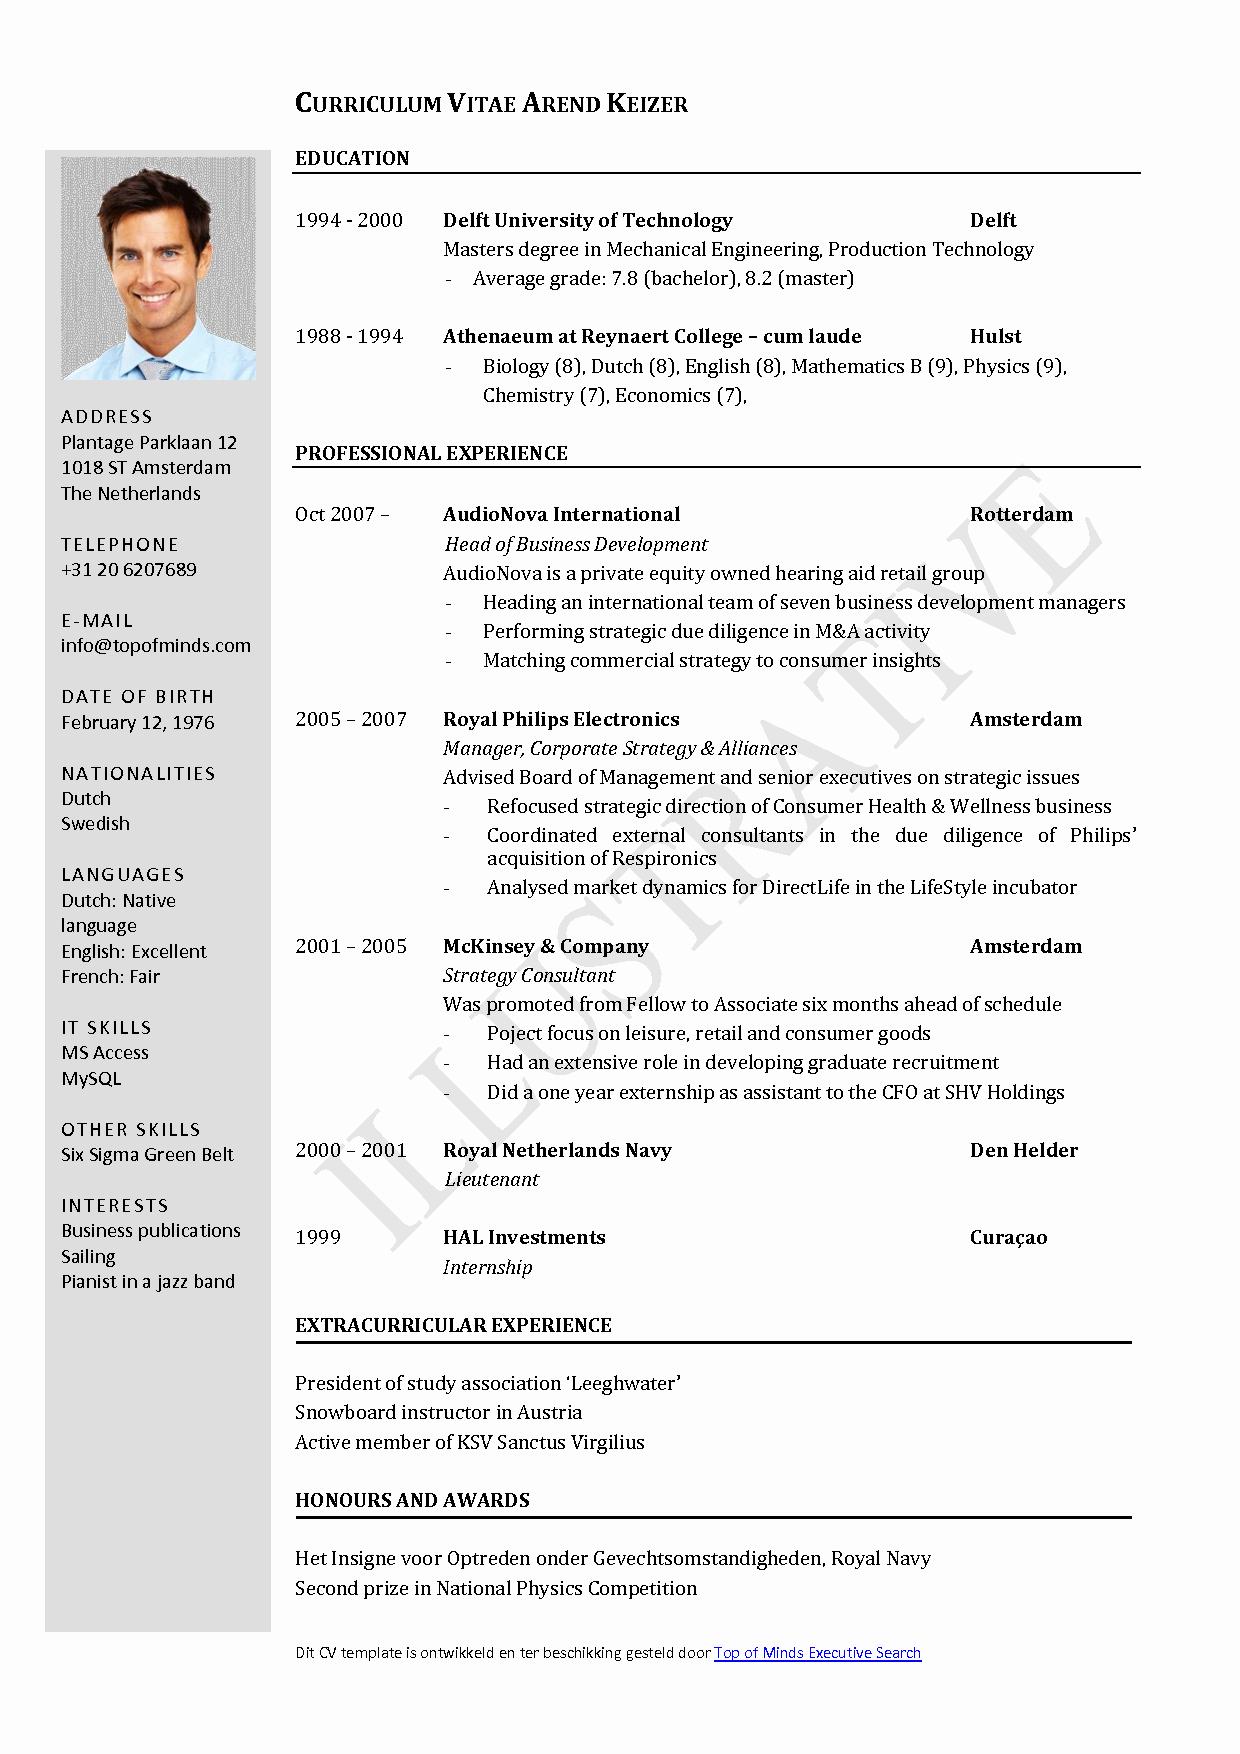 Resume Templates for Word Free Elegant Free Curriculum Vitae Template Word